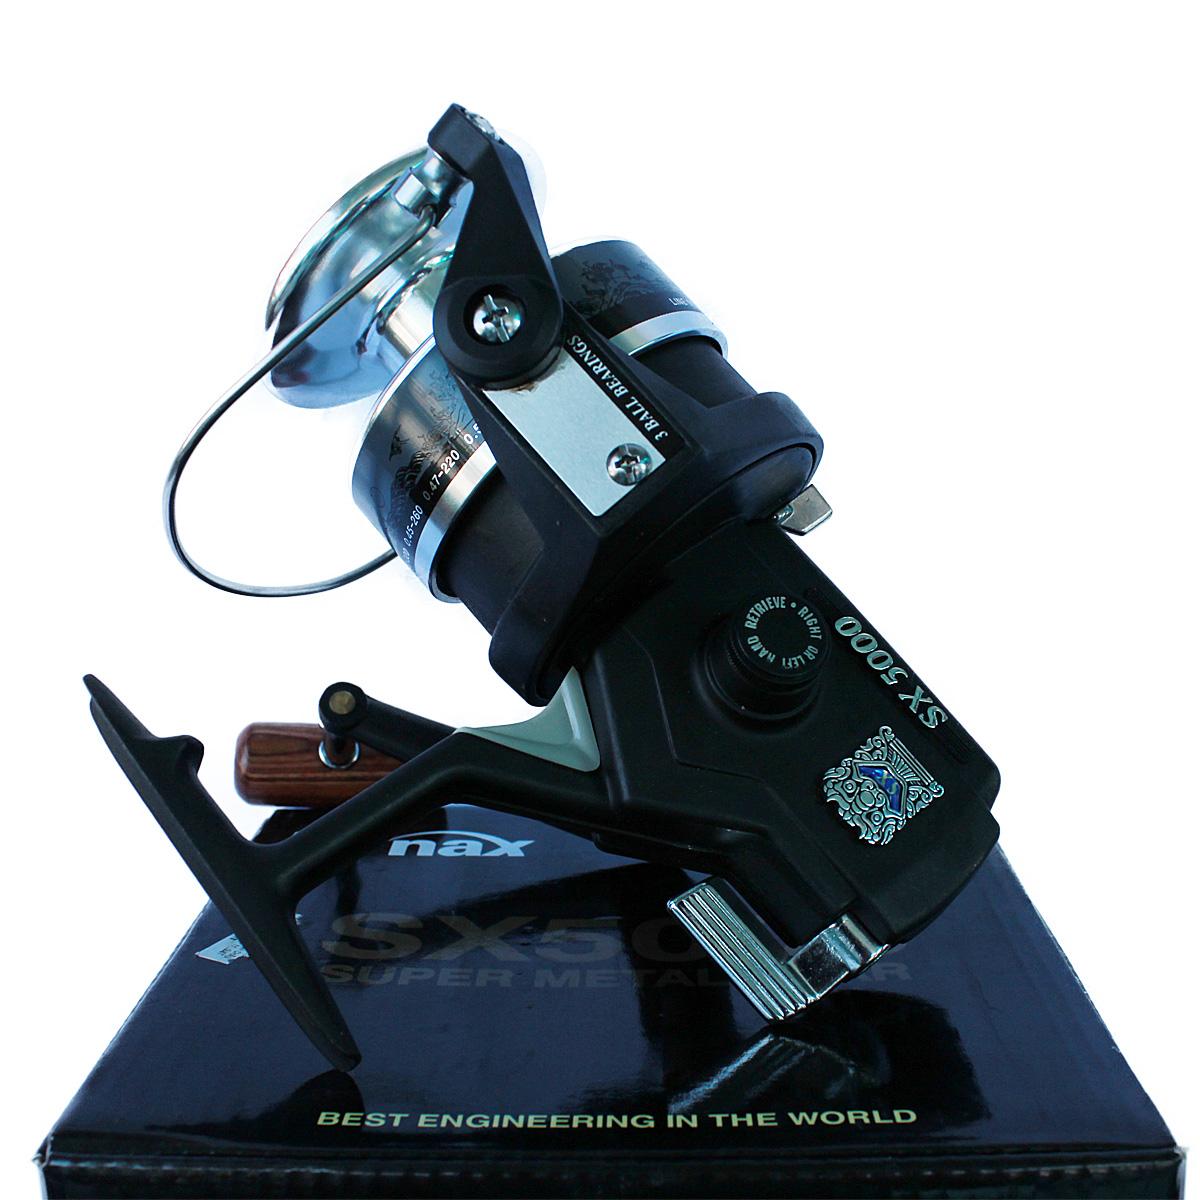 Máy Câu Cá BANAX SX 5000 BH 6 Tháng